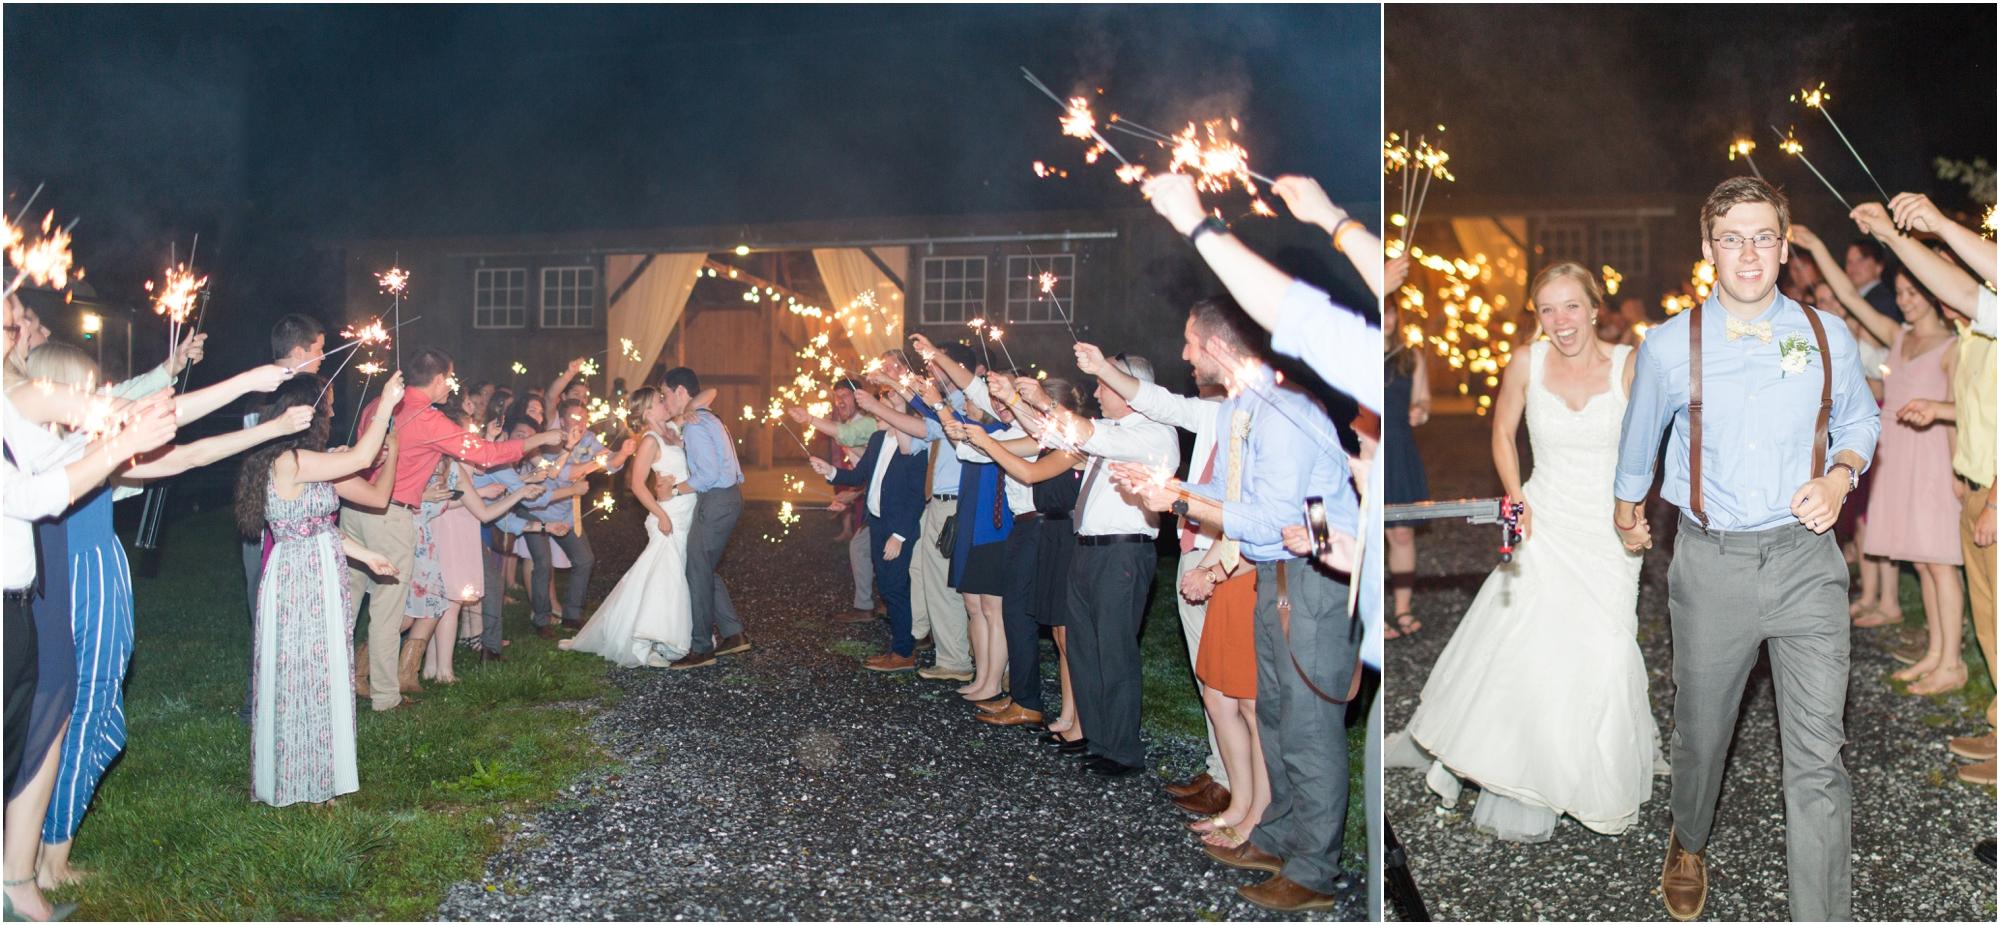 6-Rittler Wedding Reception-1295.jpg